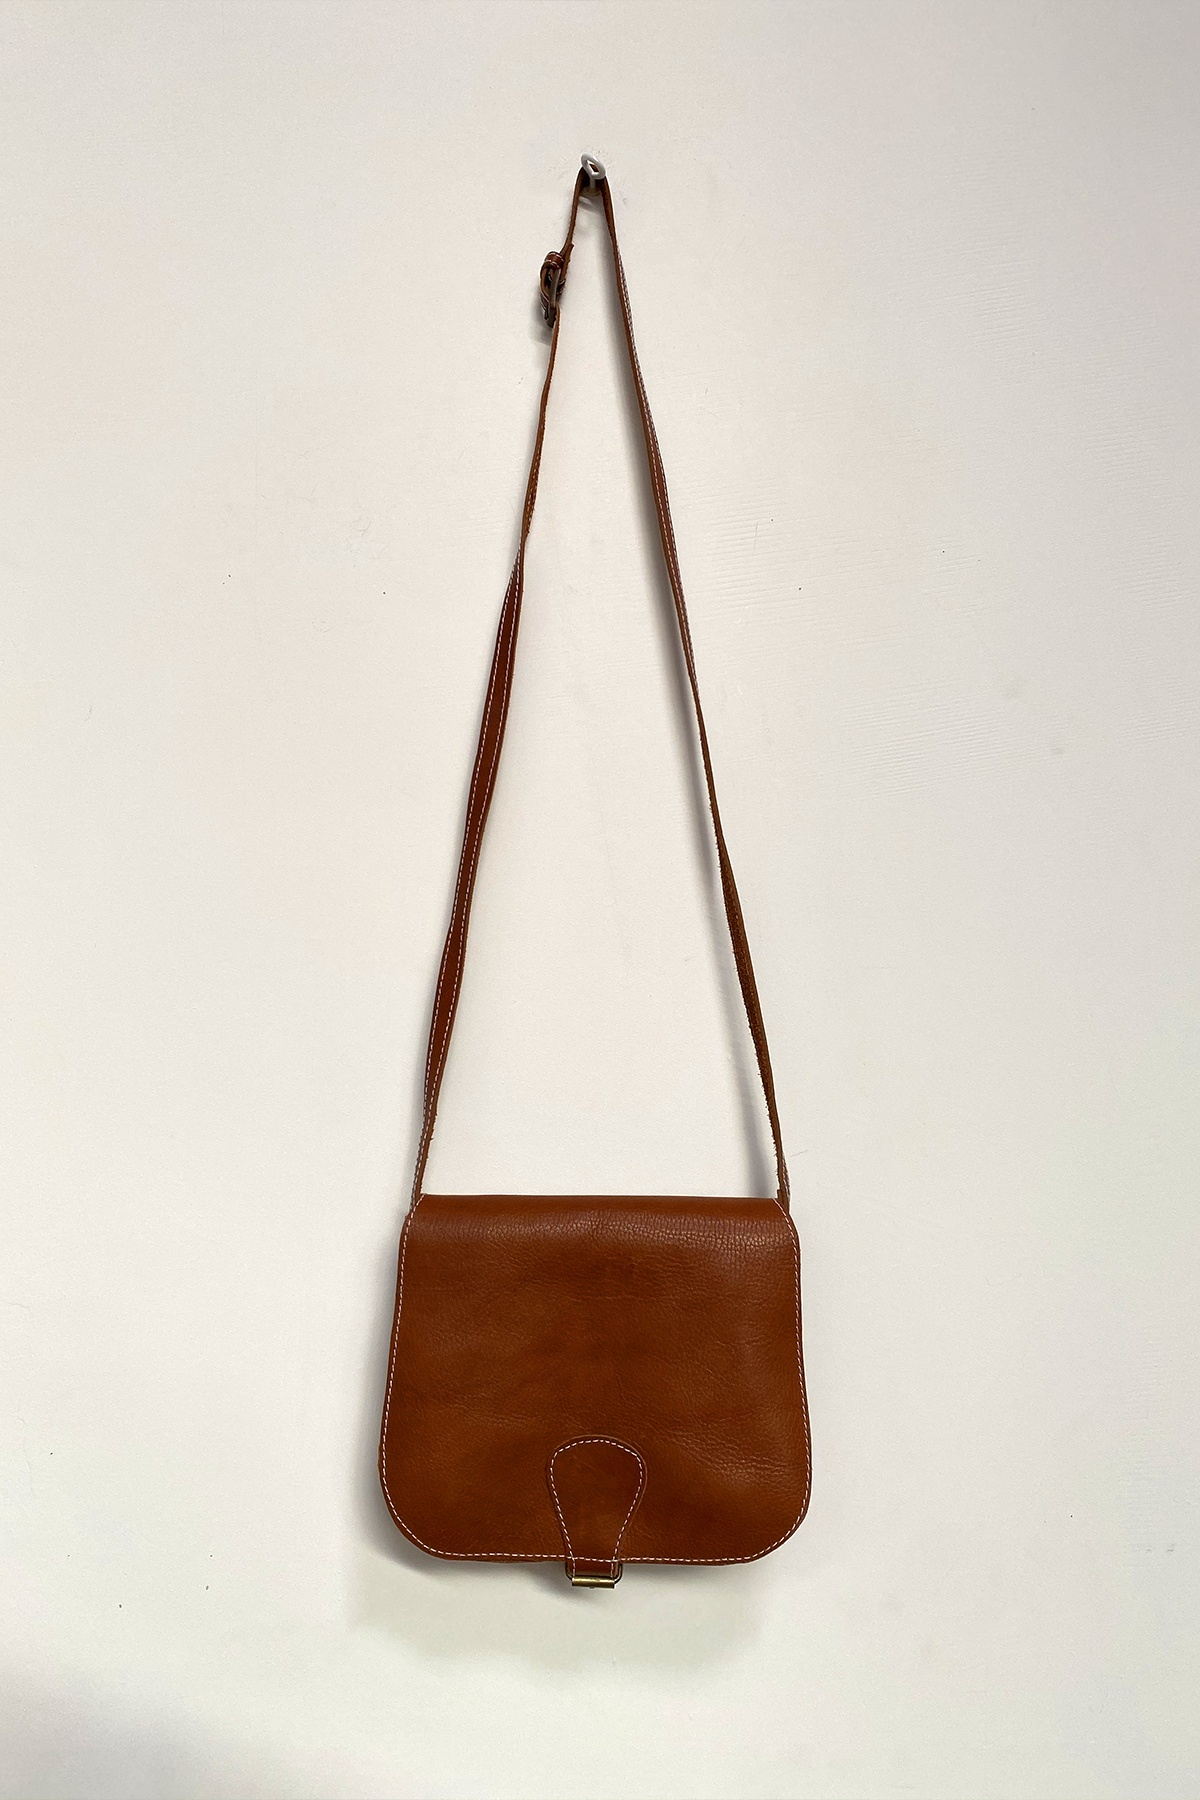 BARJAC Bag